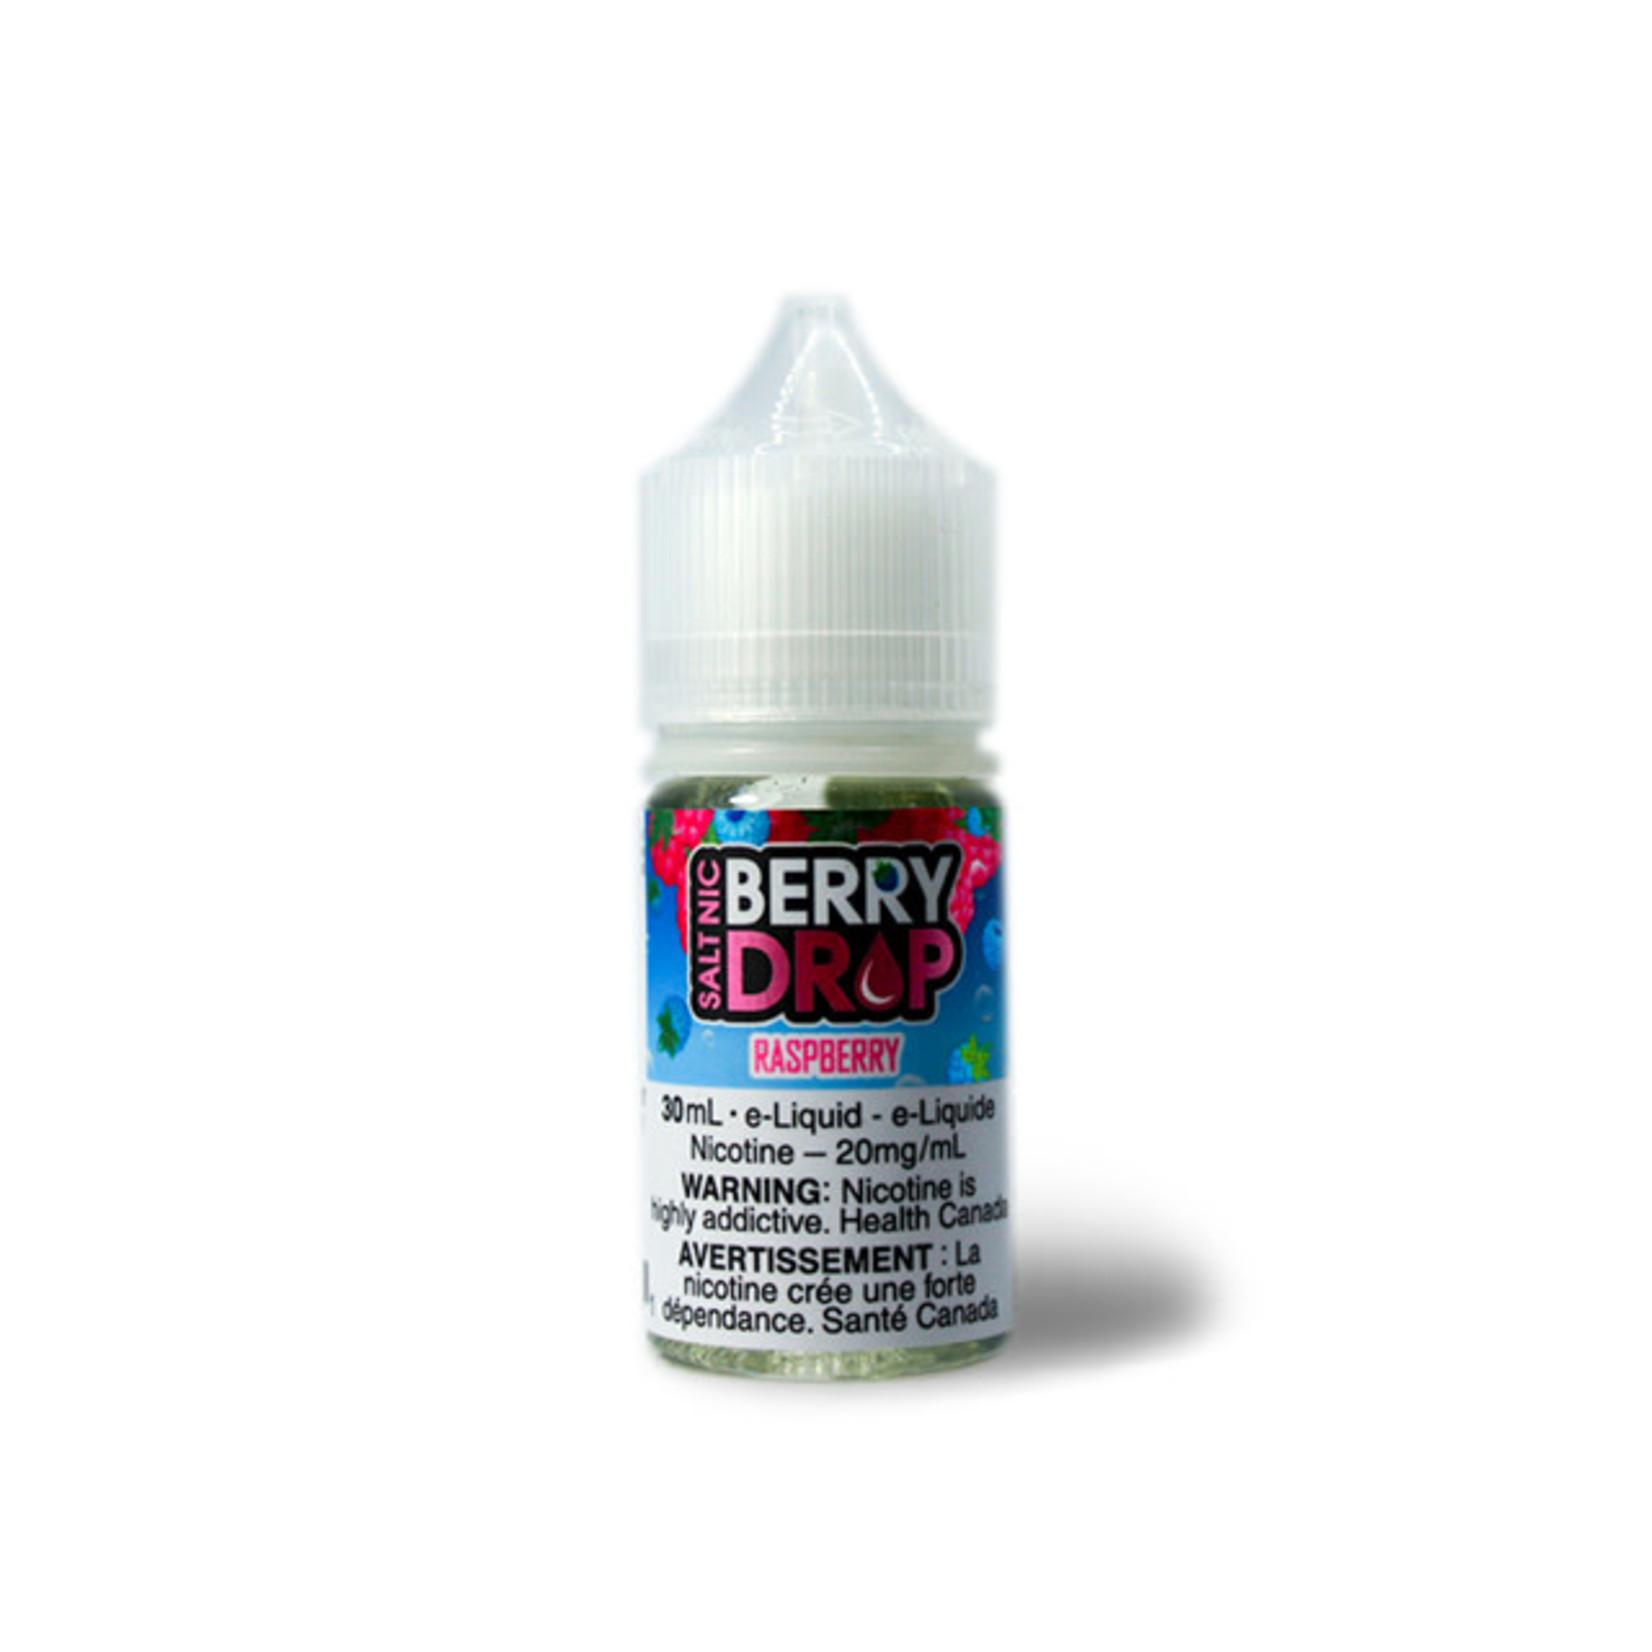 Berry Drops Salts Raspberry